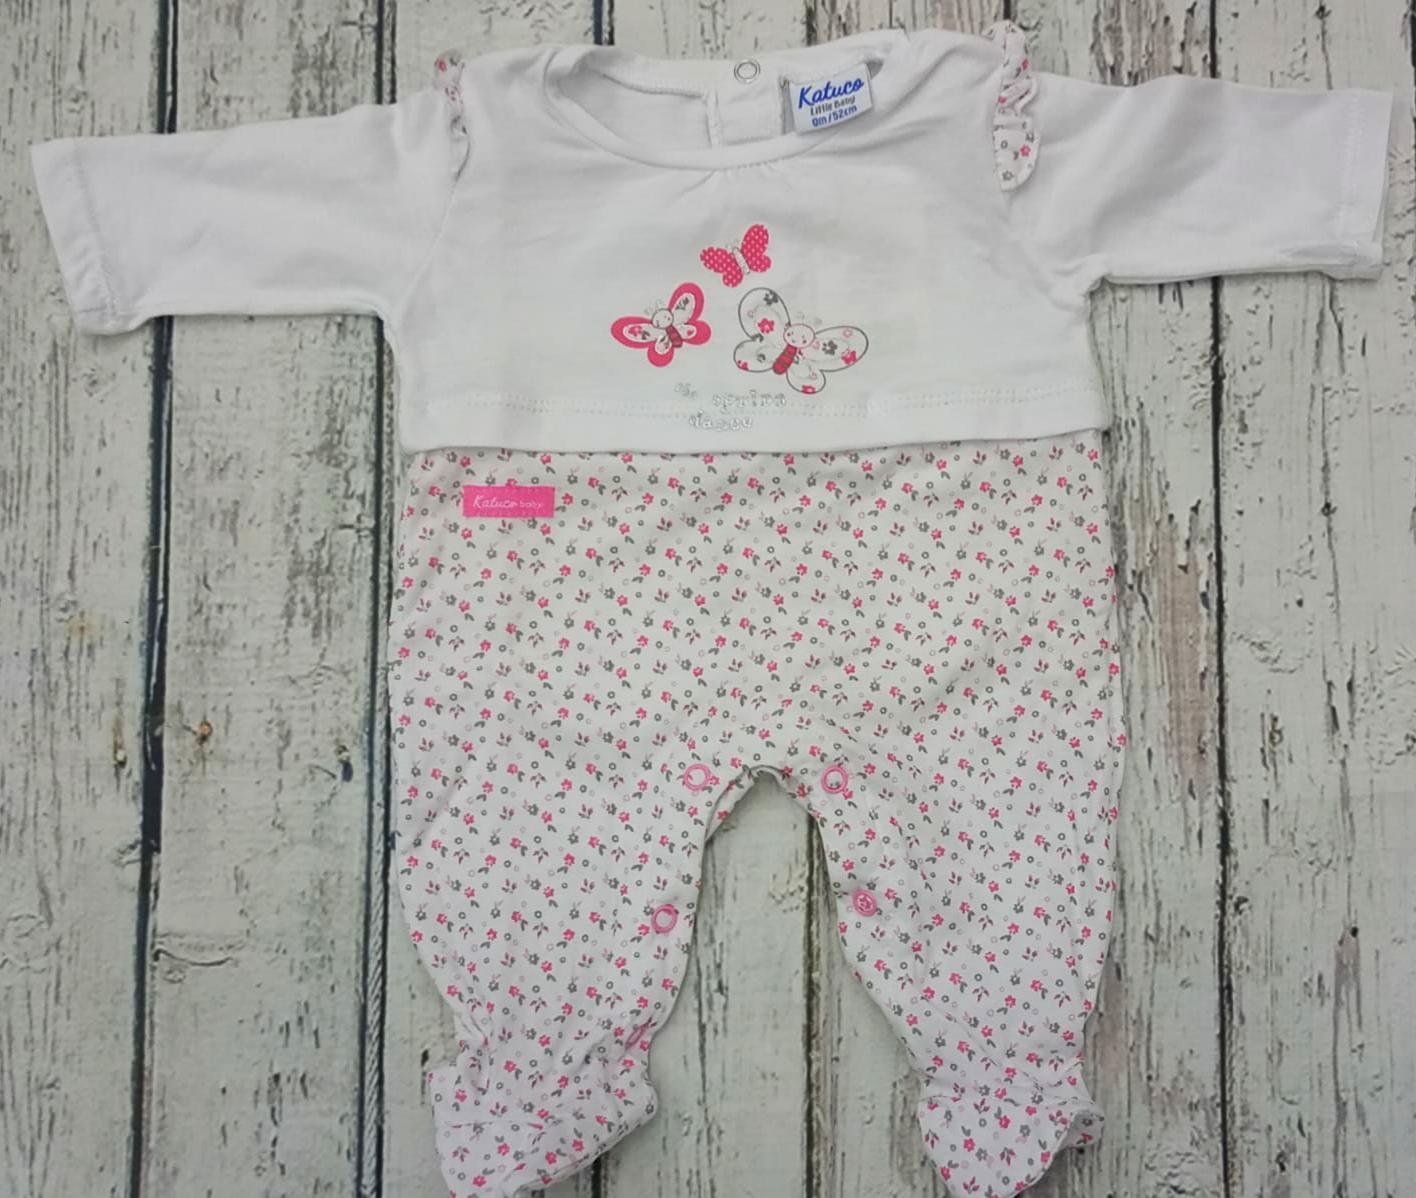 Pijama de bebé Mariposas de Yatsi.